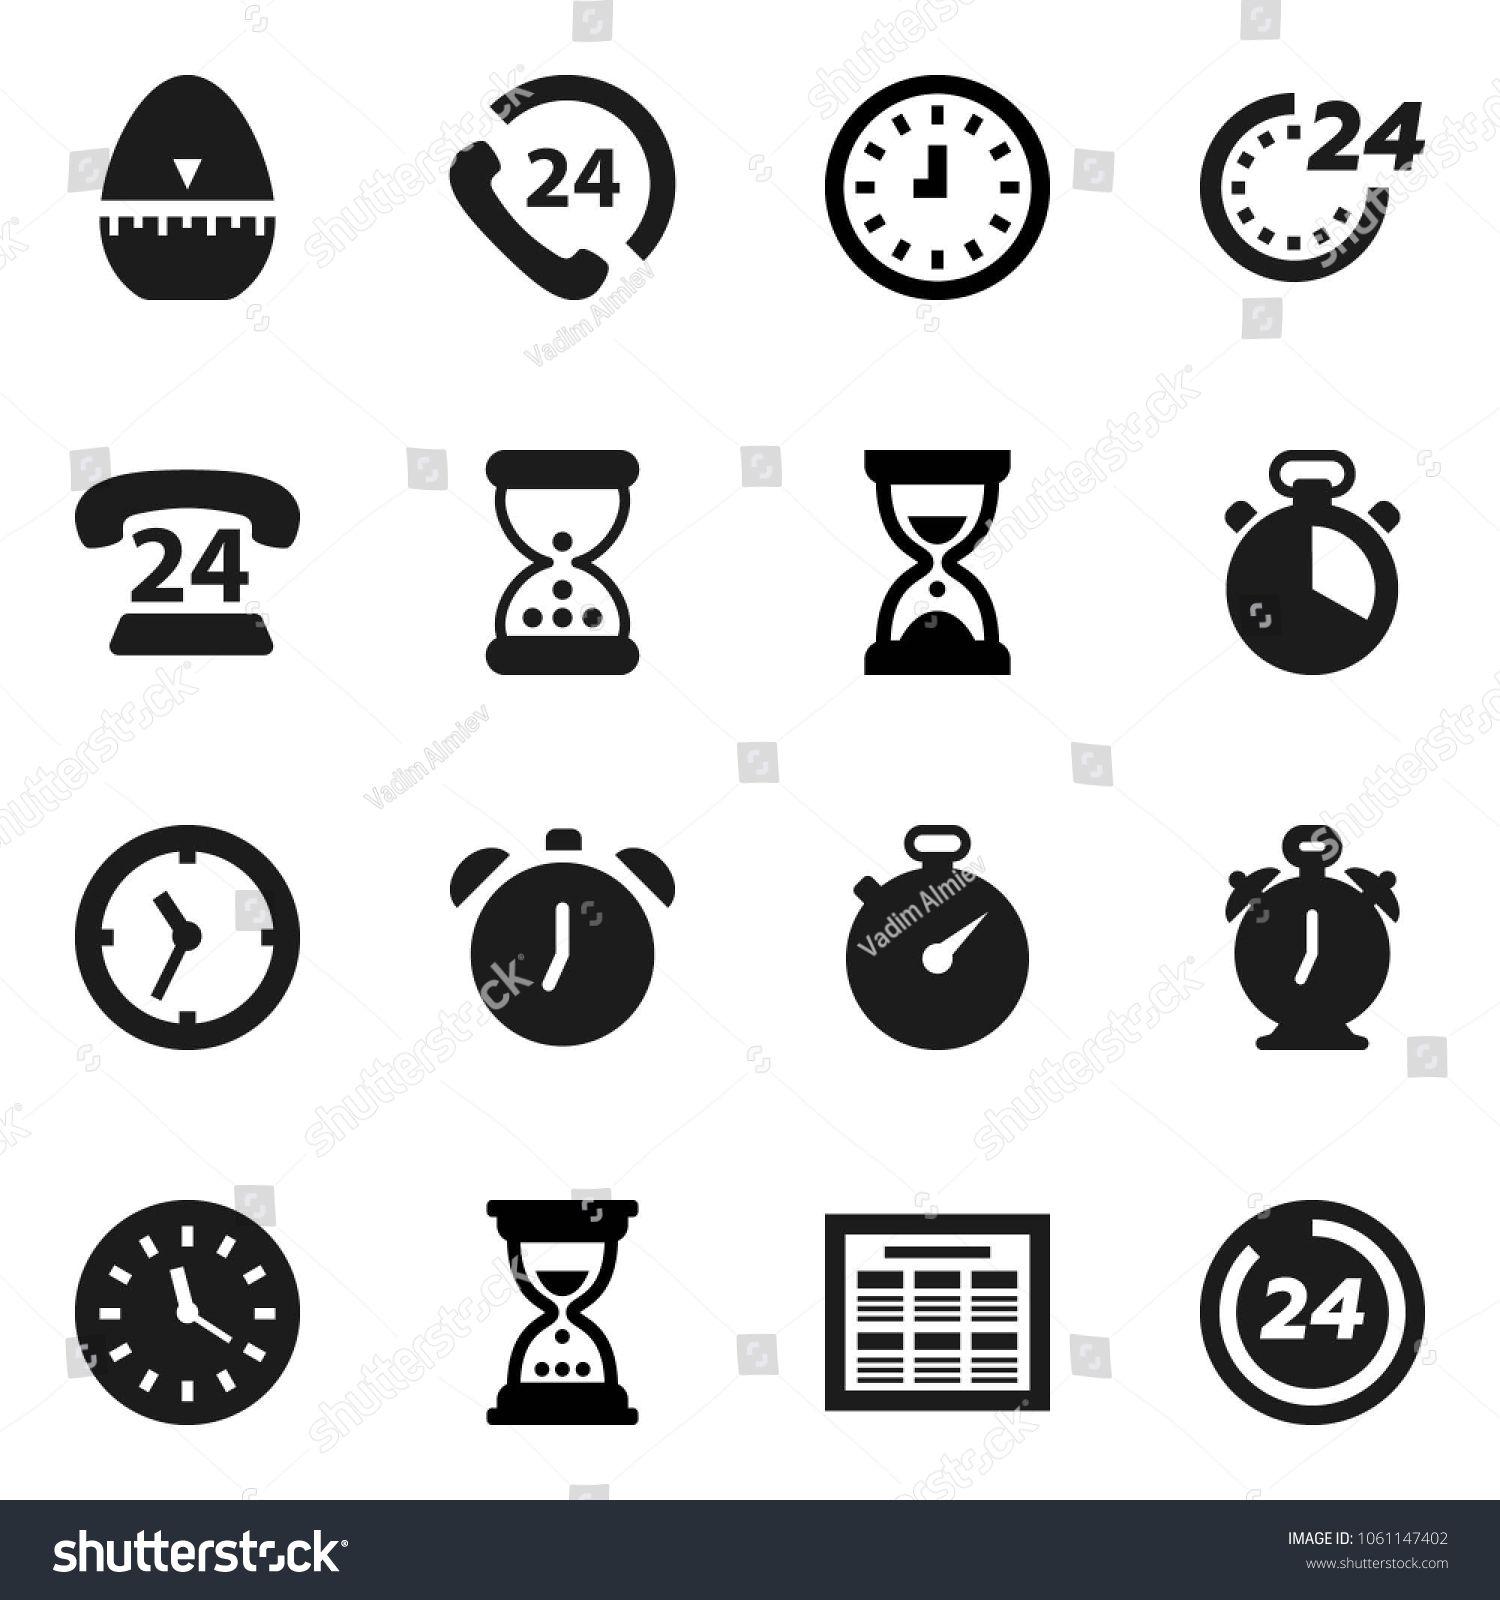 Flat vector icon set cook timer vector, alarm clock